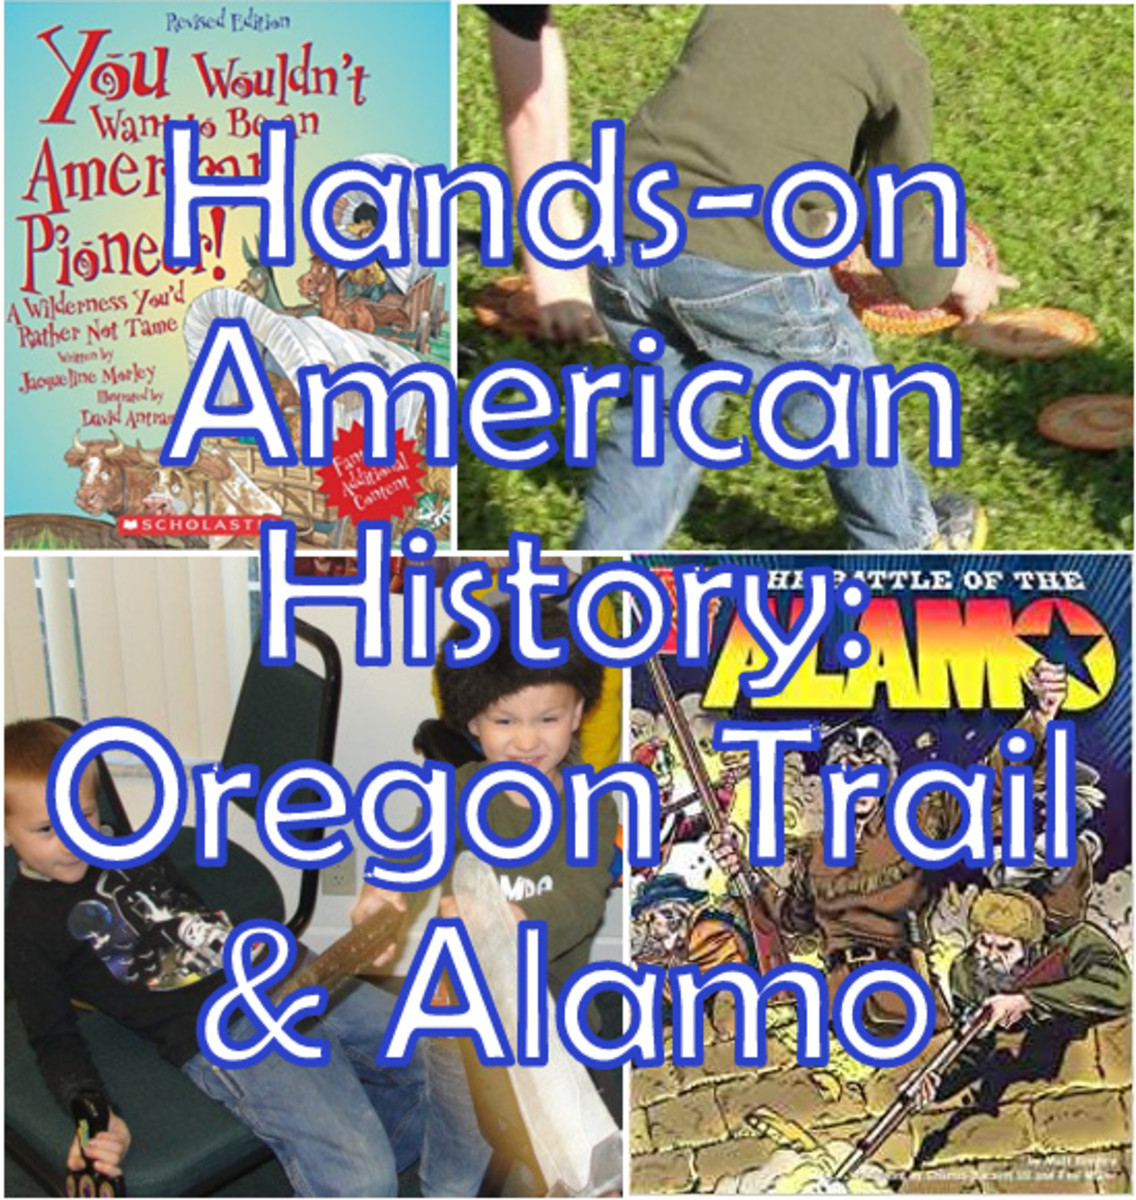 Oregon Trail & Battle of the Alamo Lesson for Kids